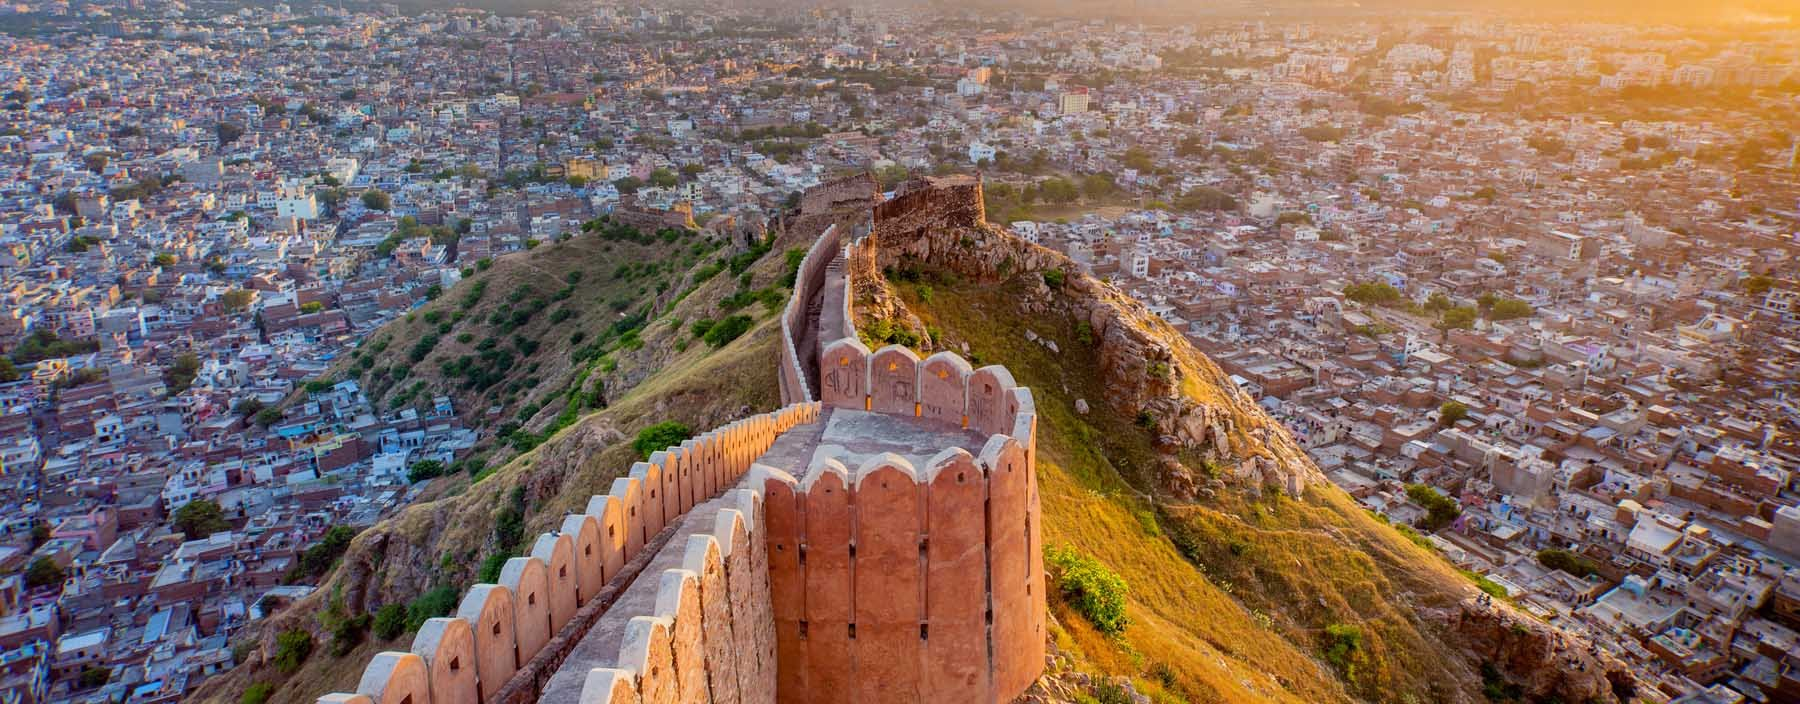 in, jaipur, view of from nahargarh fort.jpg